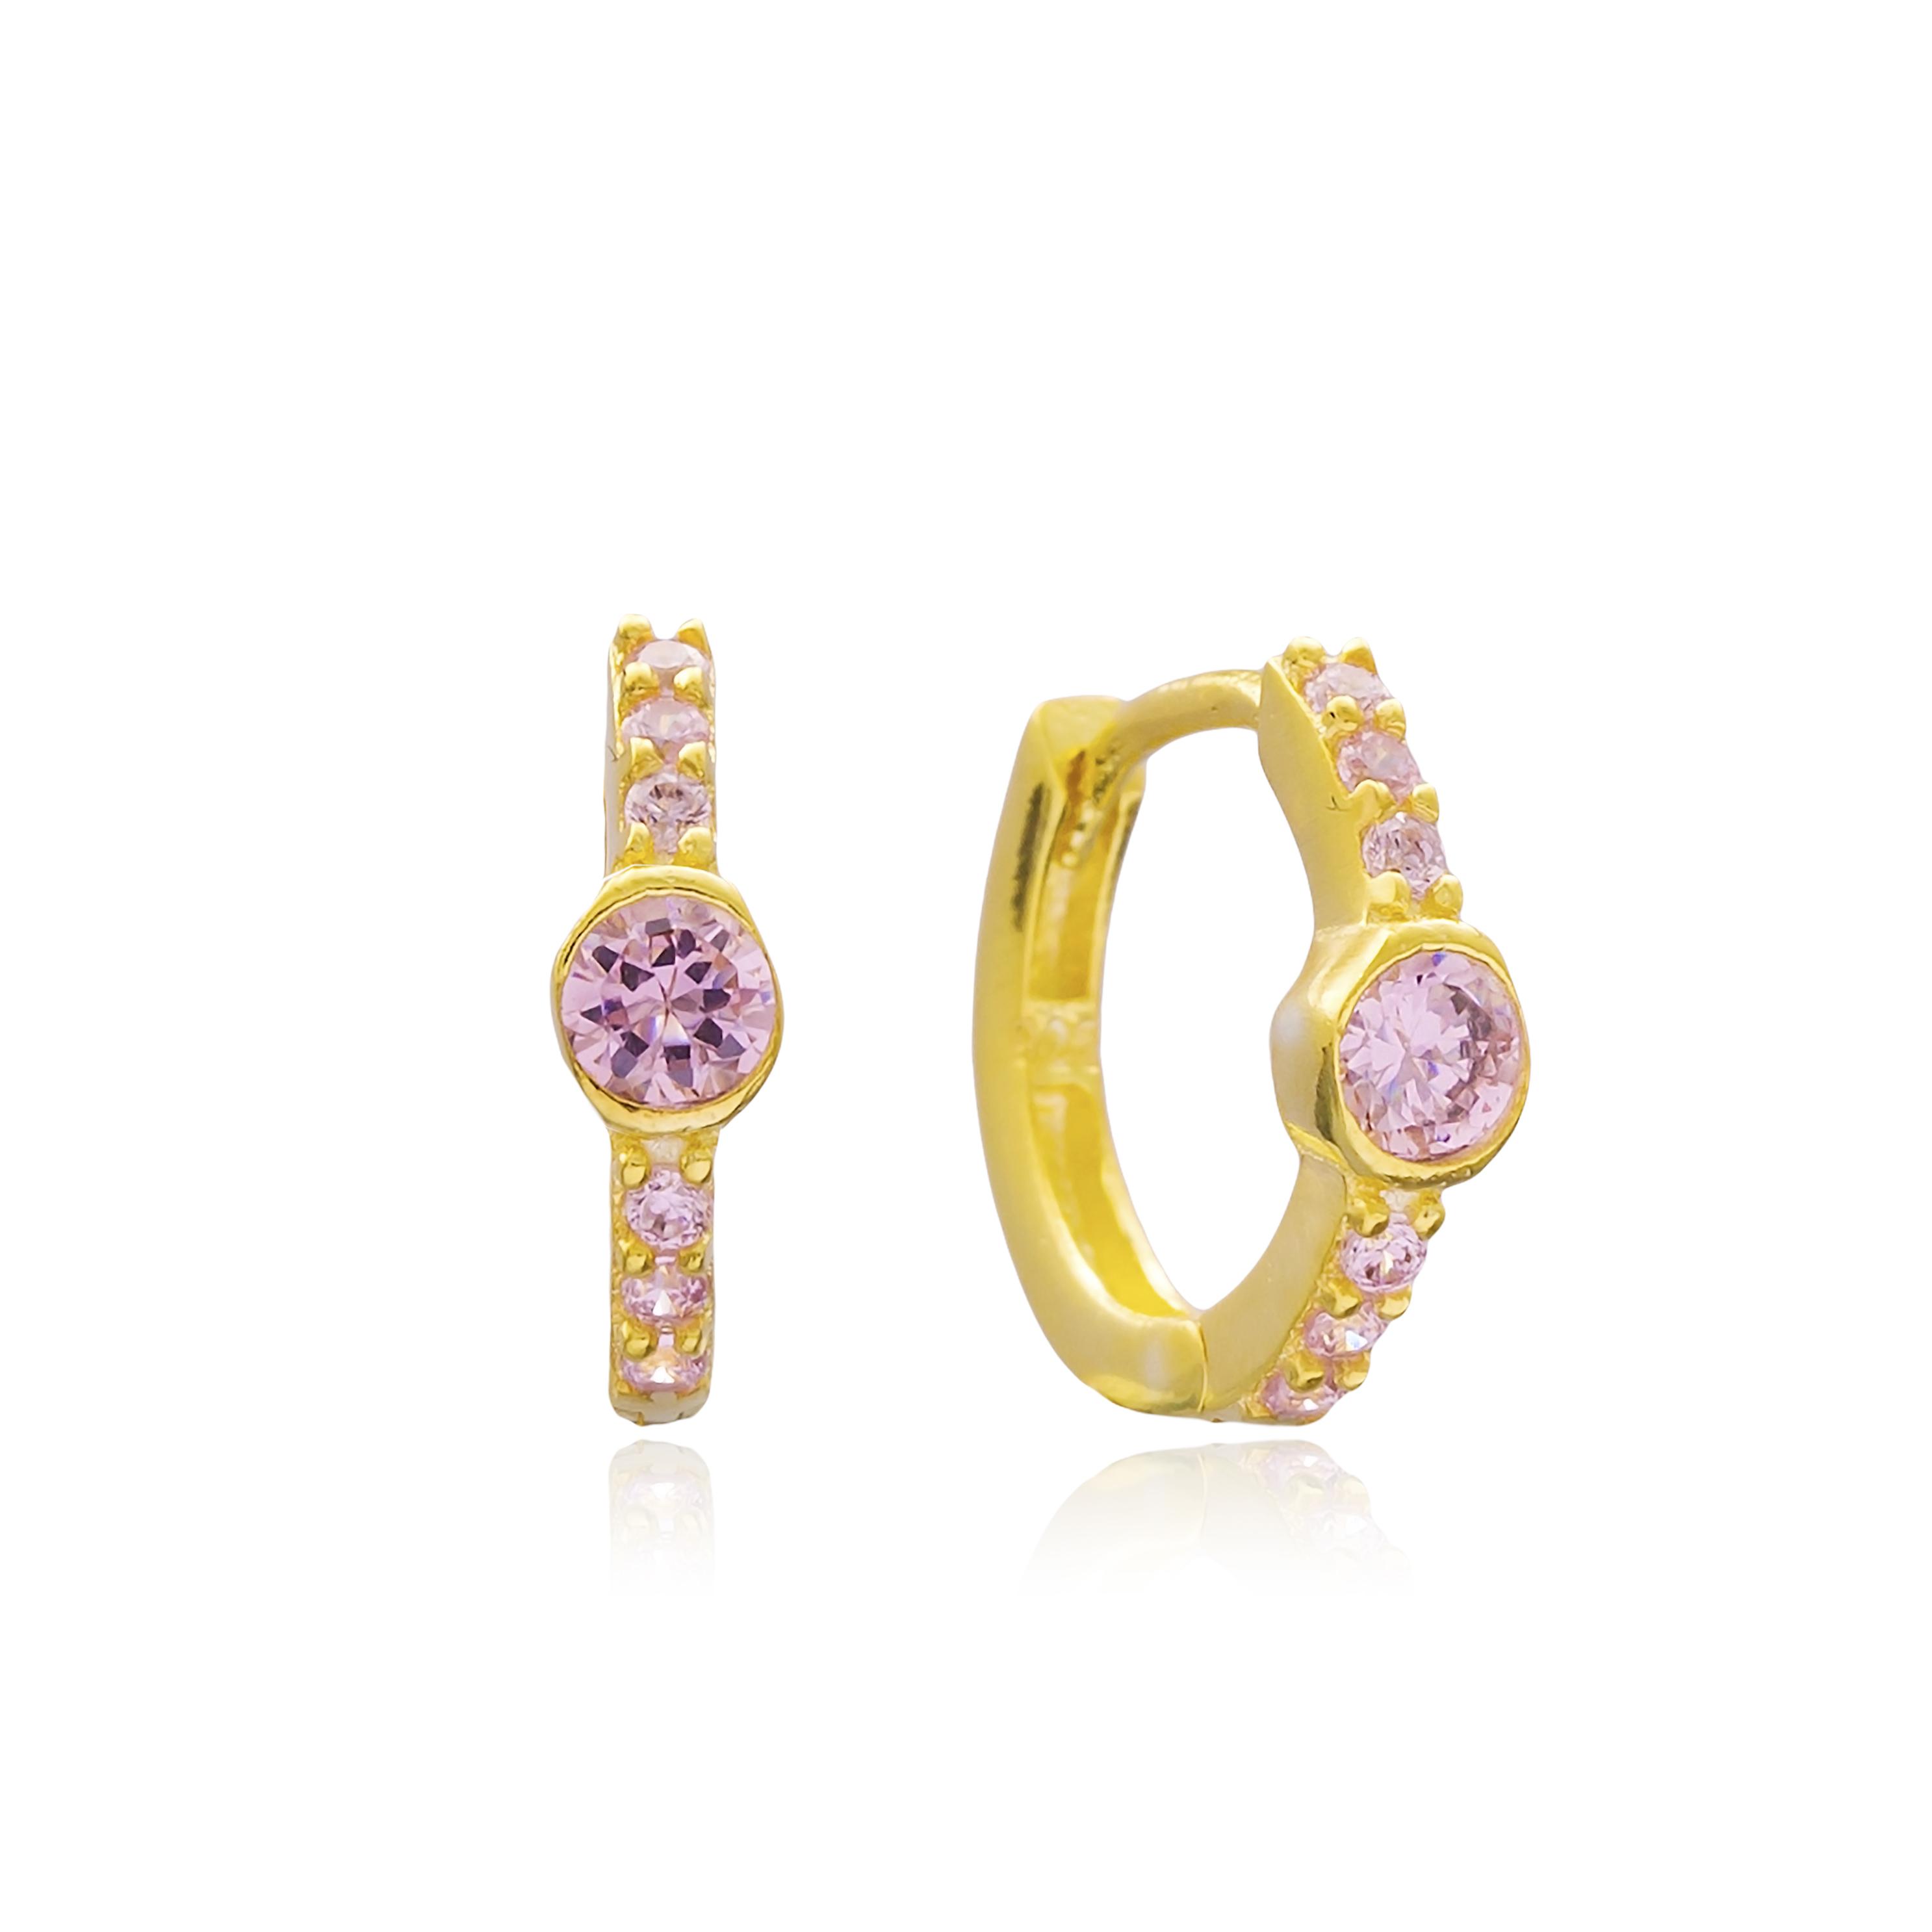 Cristina Mini Hoop Earrings Rose Gold Pink Stone